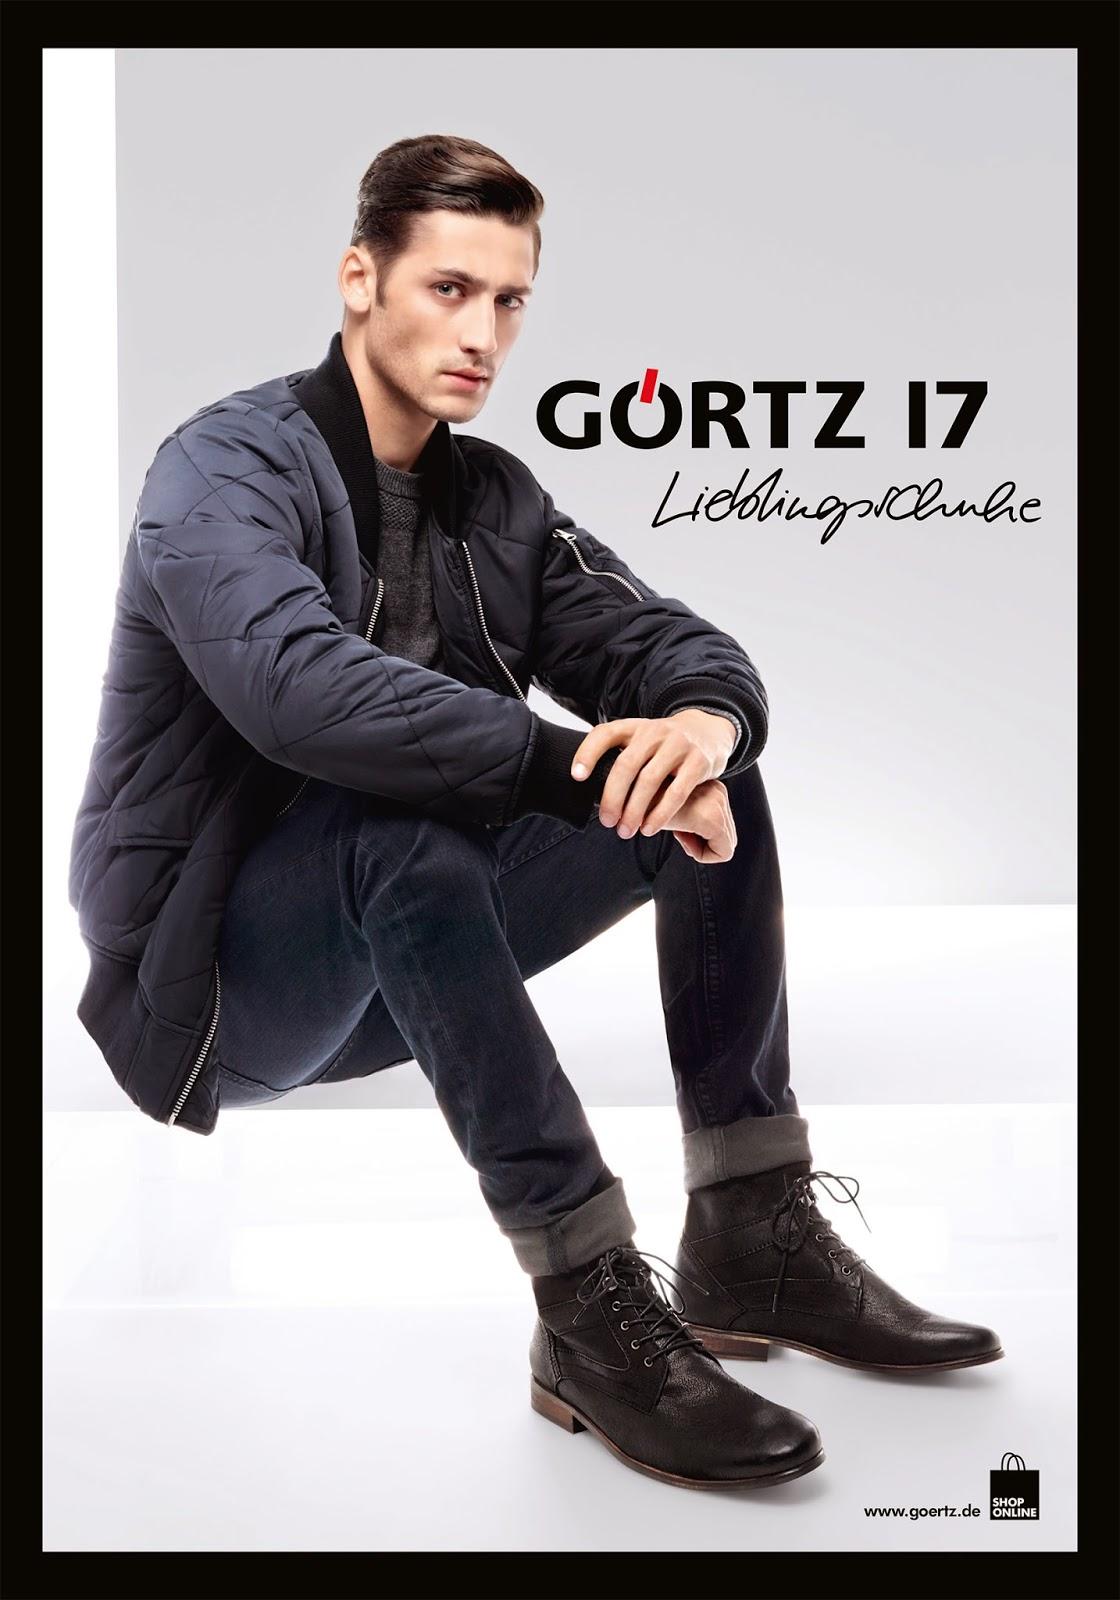 Carlos Ferra for GÖRTZ17 Fall/Winter 2014 Ad Campaign